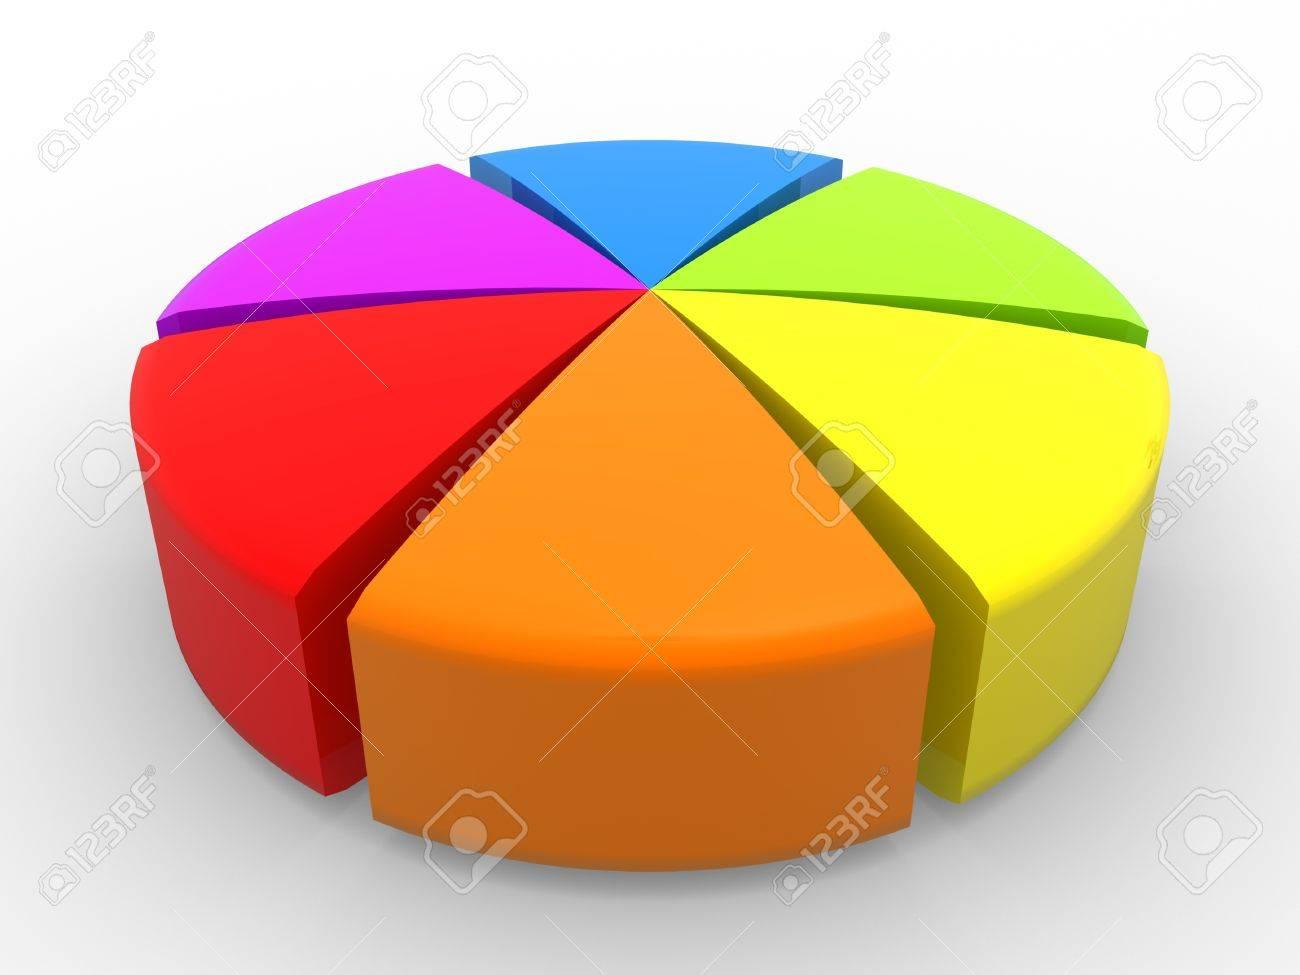 3d image of colorful pie chart Standard-Bild - 17639979